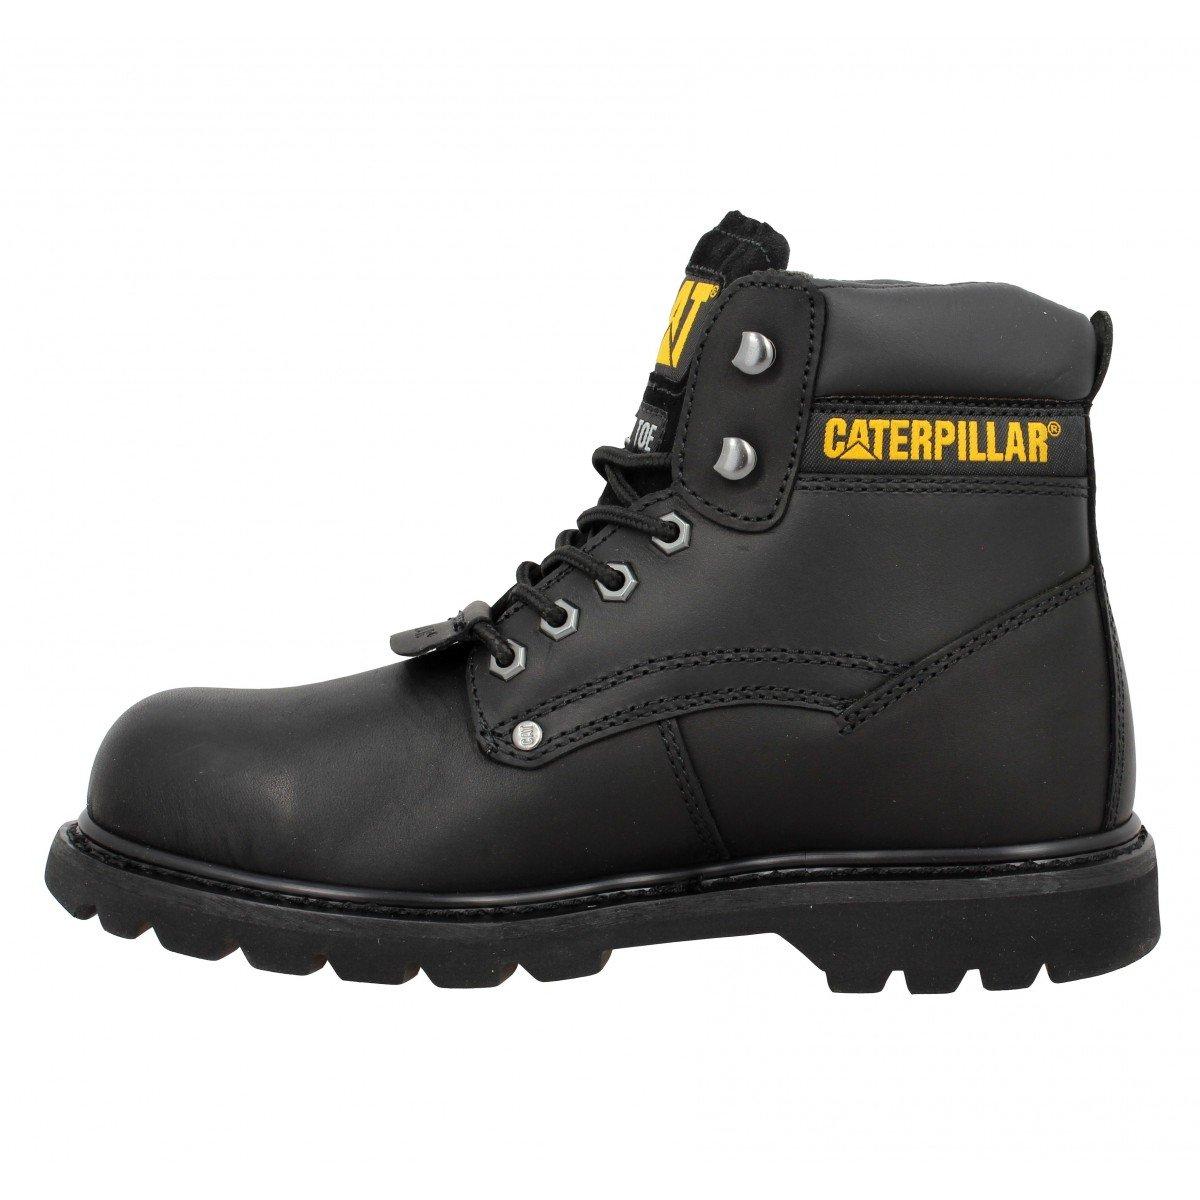 f04d435fe629bb Caterpillar Sheffield ST Men's Boots Black Size: 4.5: Amazon.co.uk: Shoes &  Bags